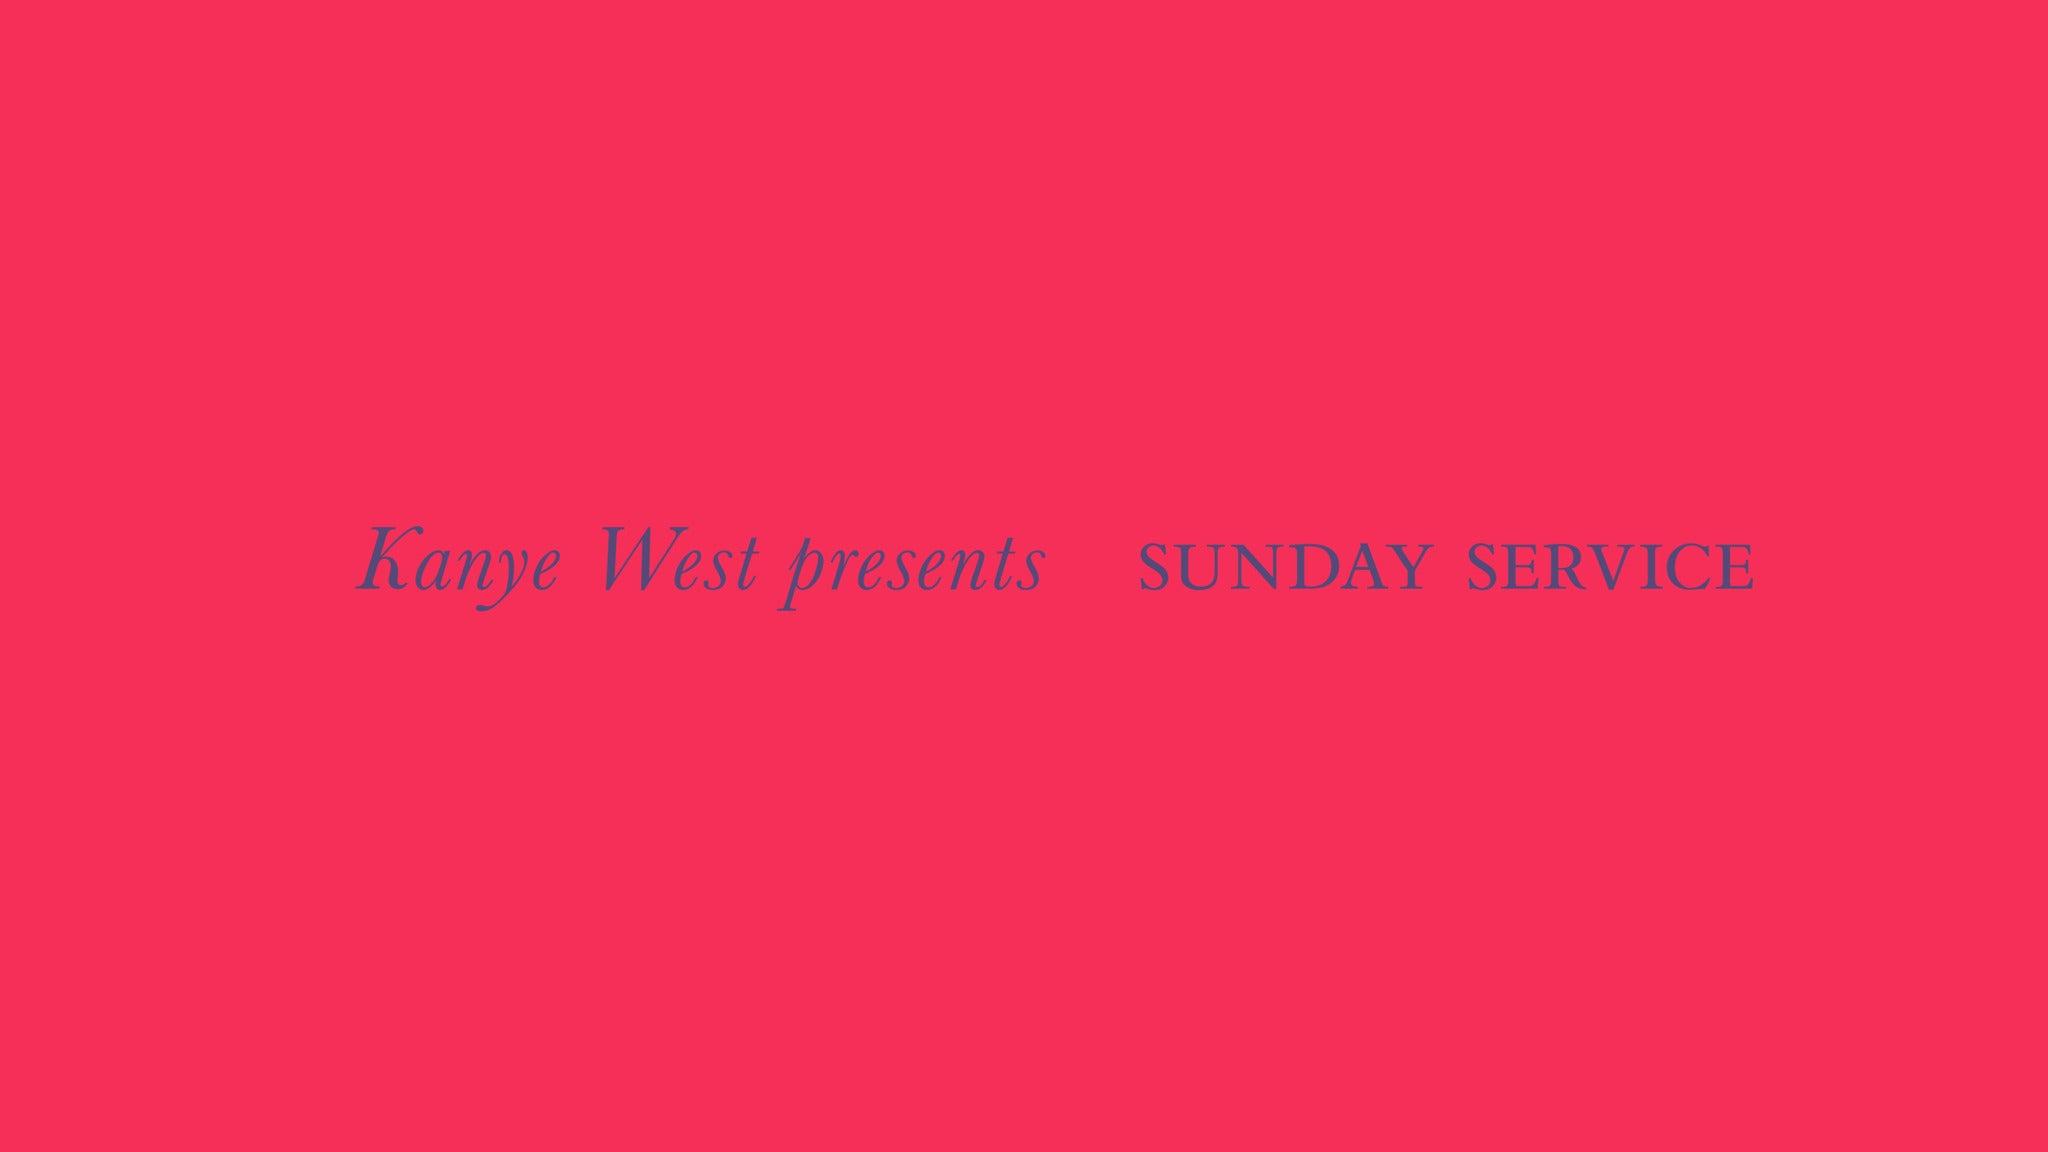 Kanye West Presents The Donda Album Release pre-sale code for show tickets in Atlanta, GA (Mercedes-Benz Stadium)